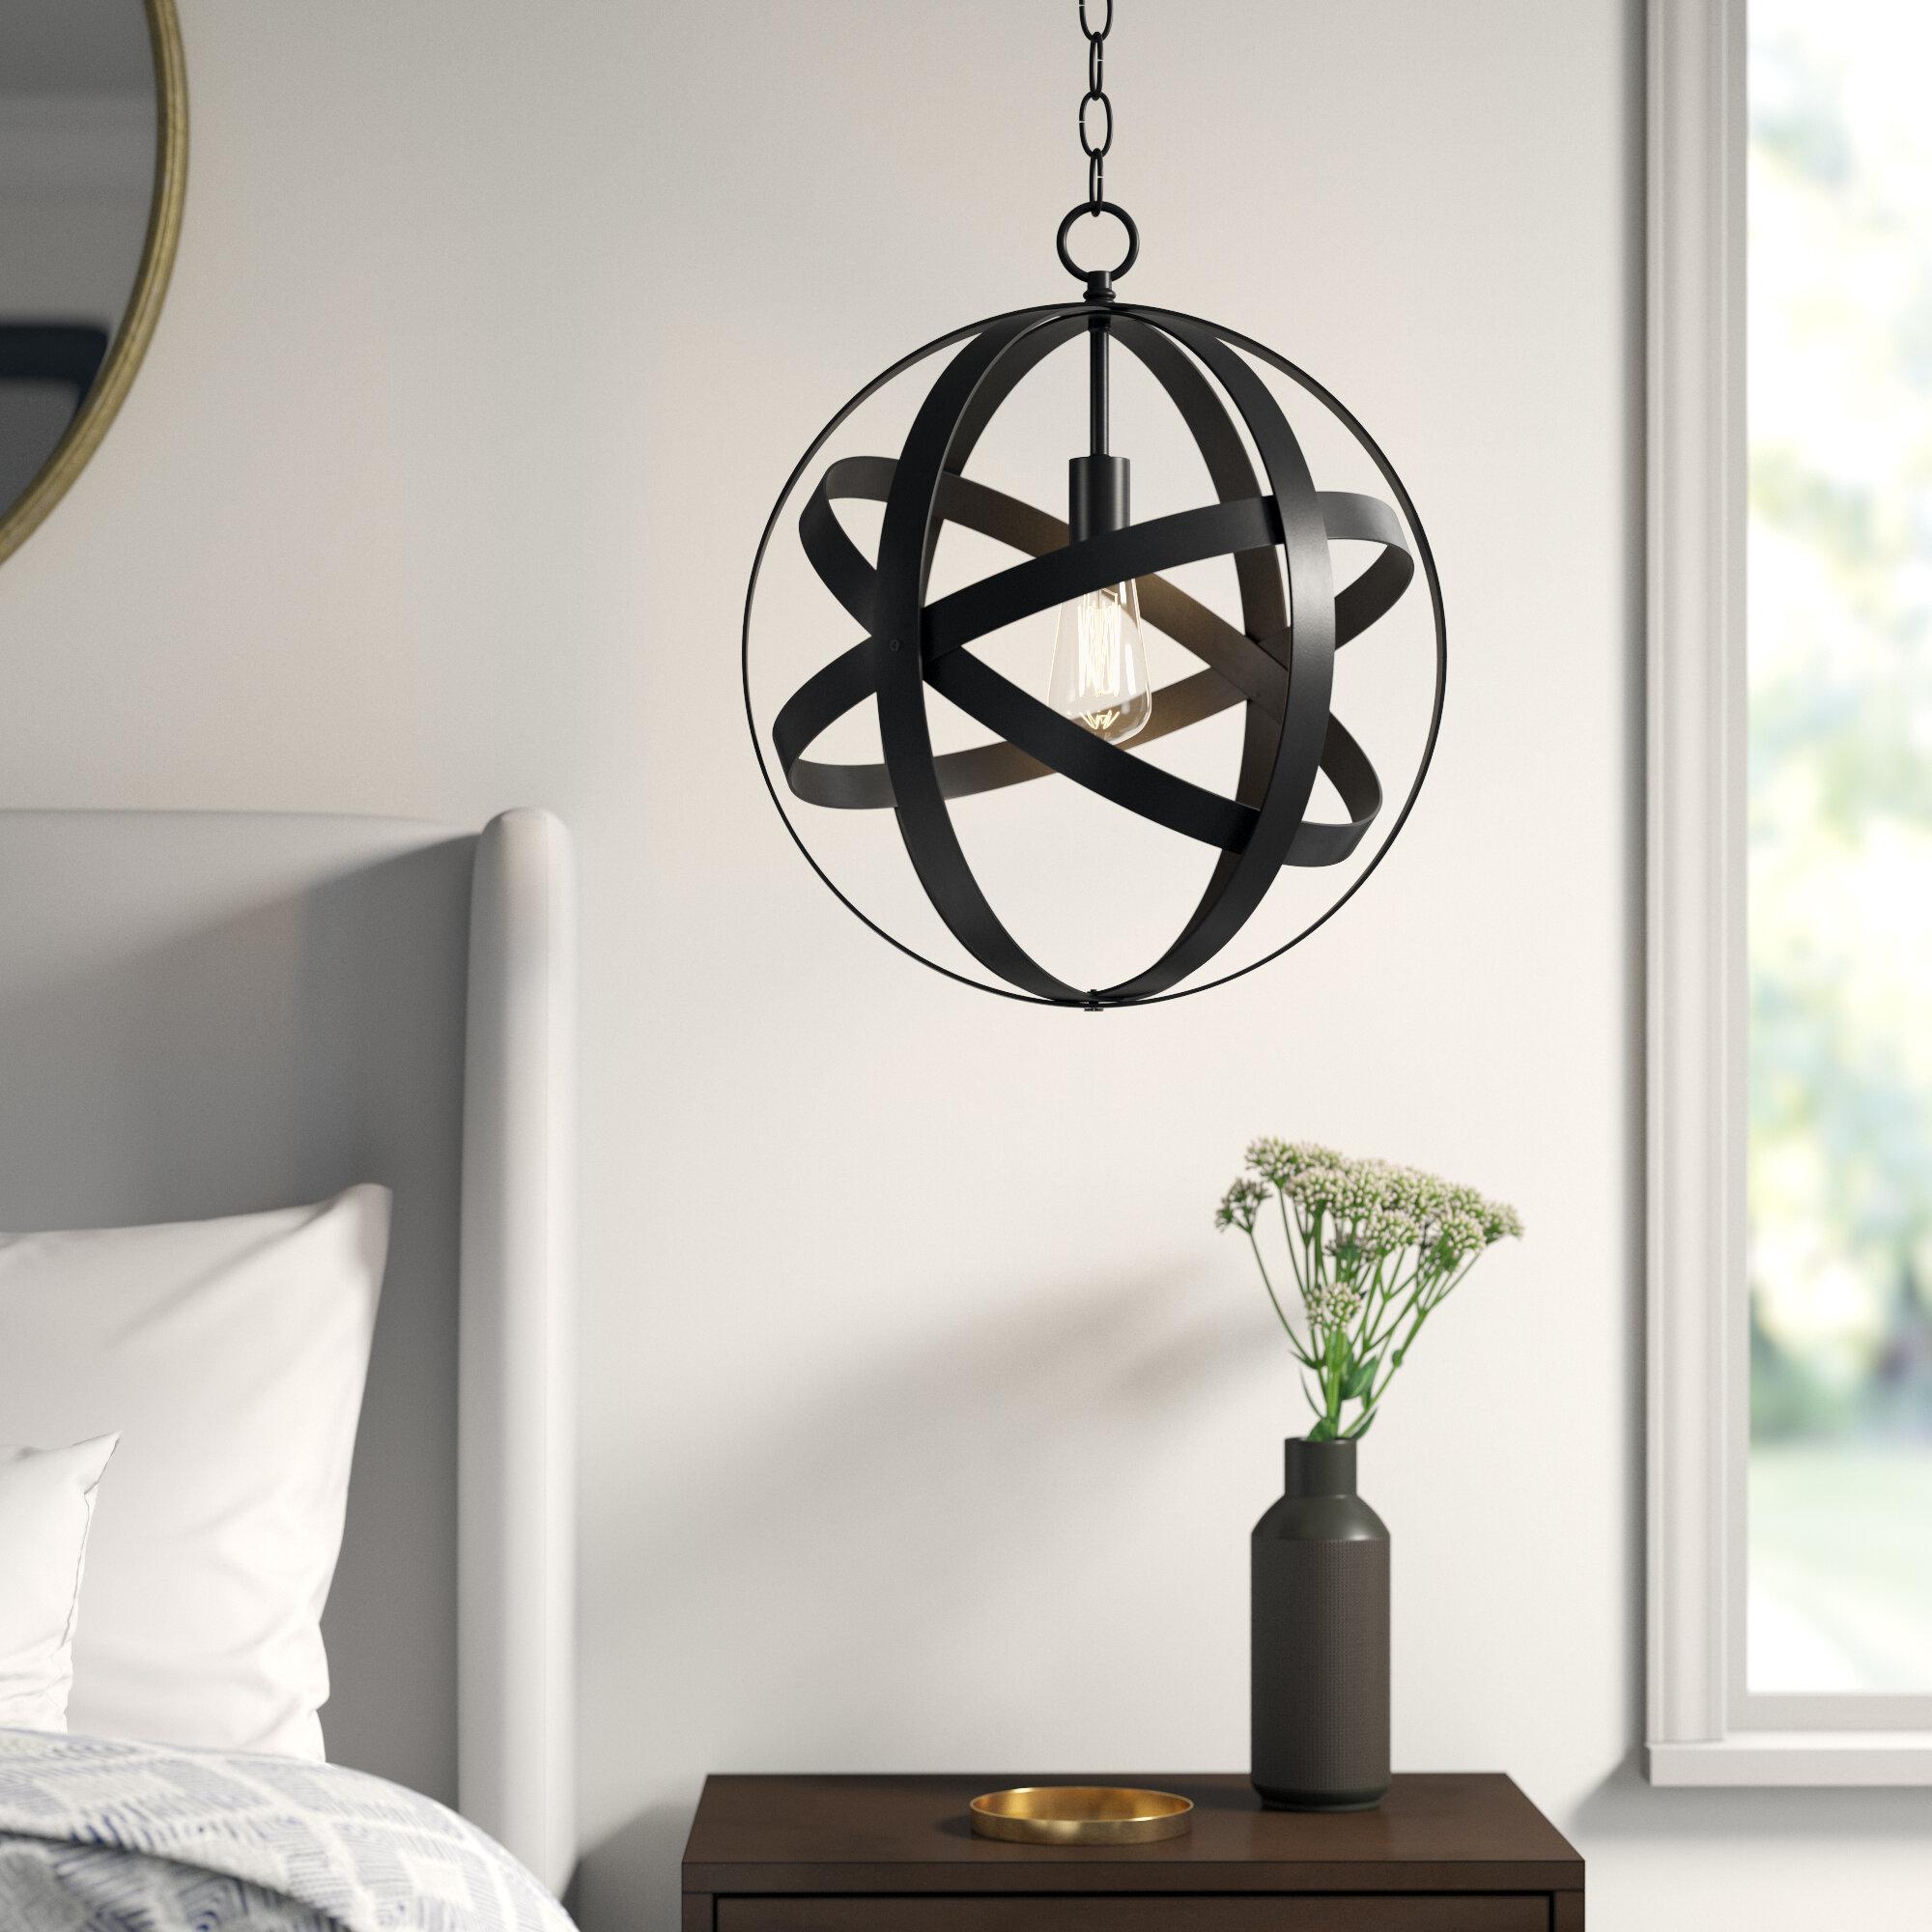 Ealey 1 Light Globe Pendant Throughout Irwin 1 Light Single Globe Pendants (View 6 of 30)